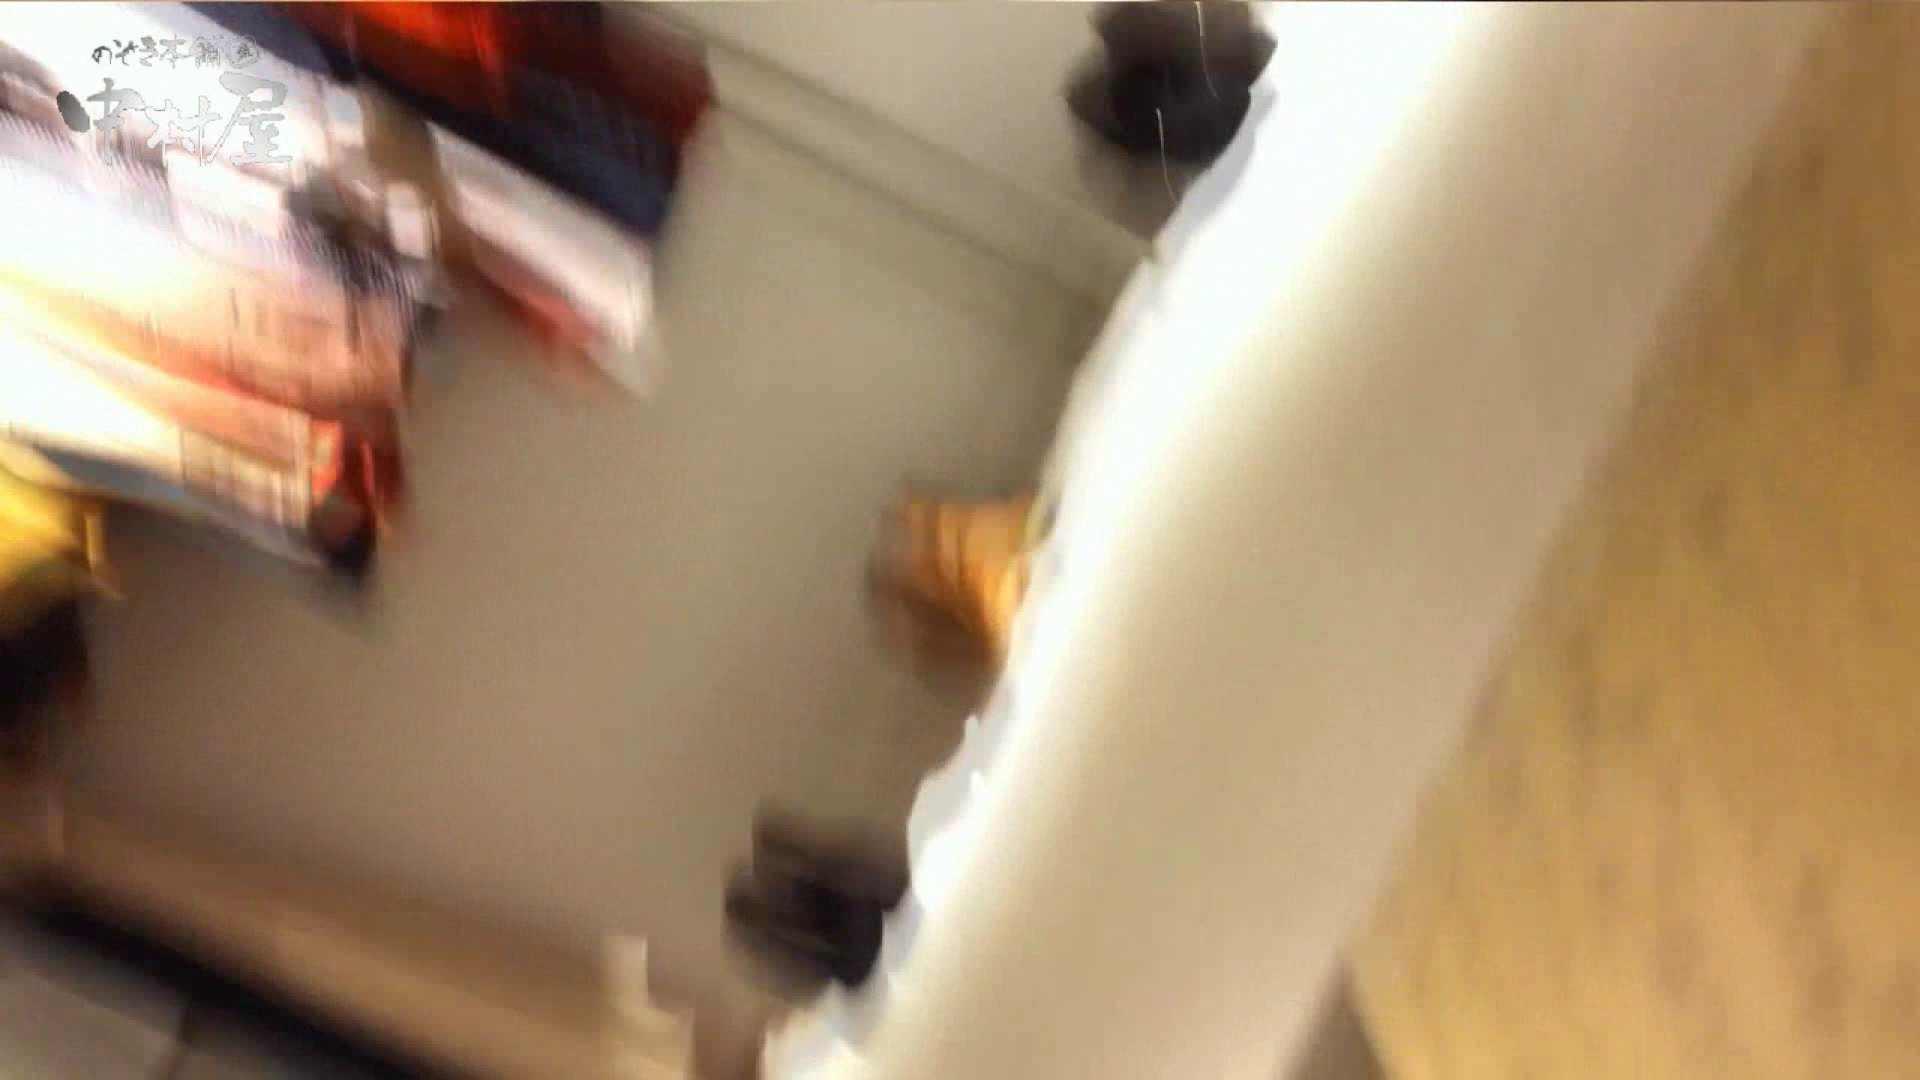 vol.84 美人アパレル胸チラ&パンチラ 帽子オネェさんに胸元アタック! チラ 盗撮オマンコ無修正動画無料 51PICs 8